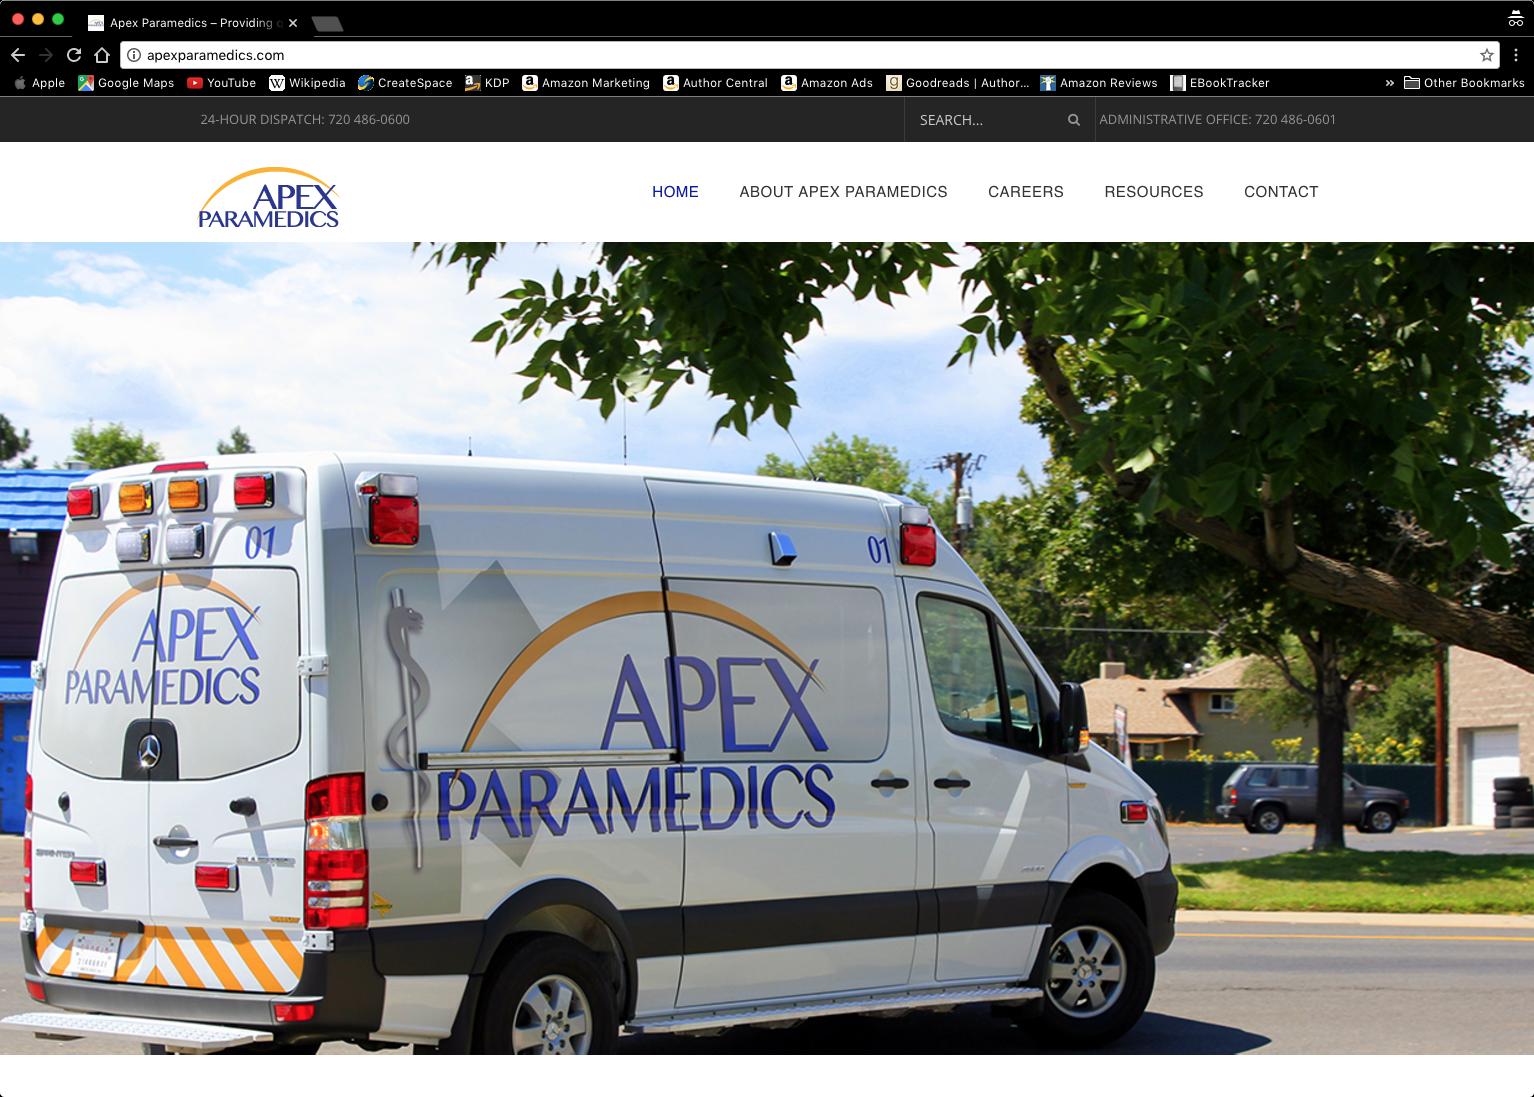 Spider Trainers' gallery: apexparamedics.com (image)